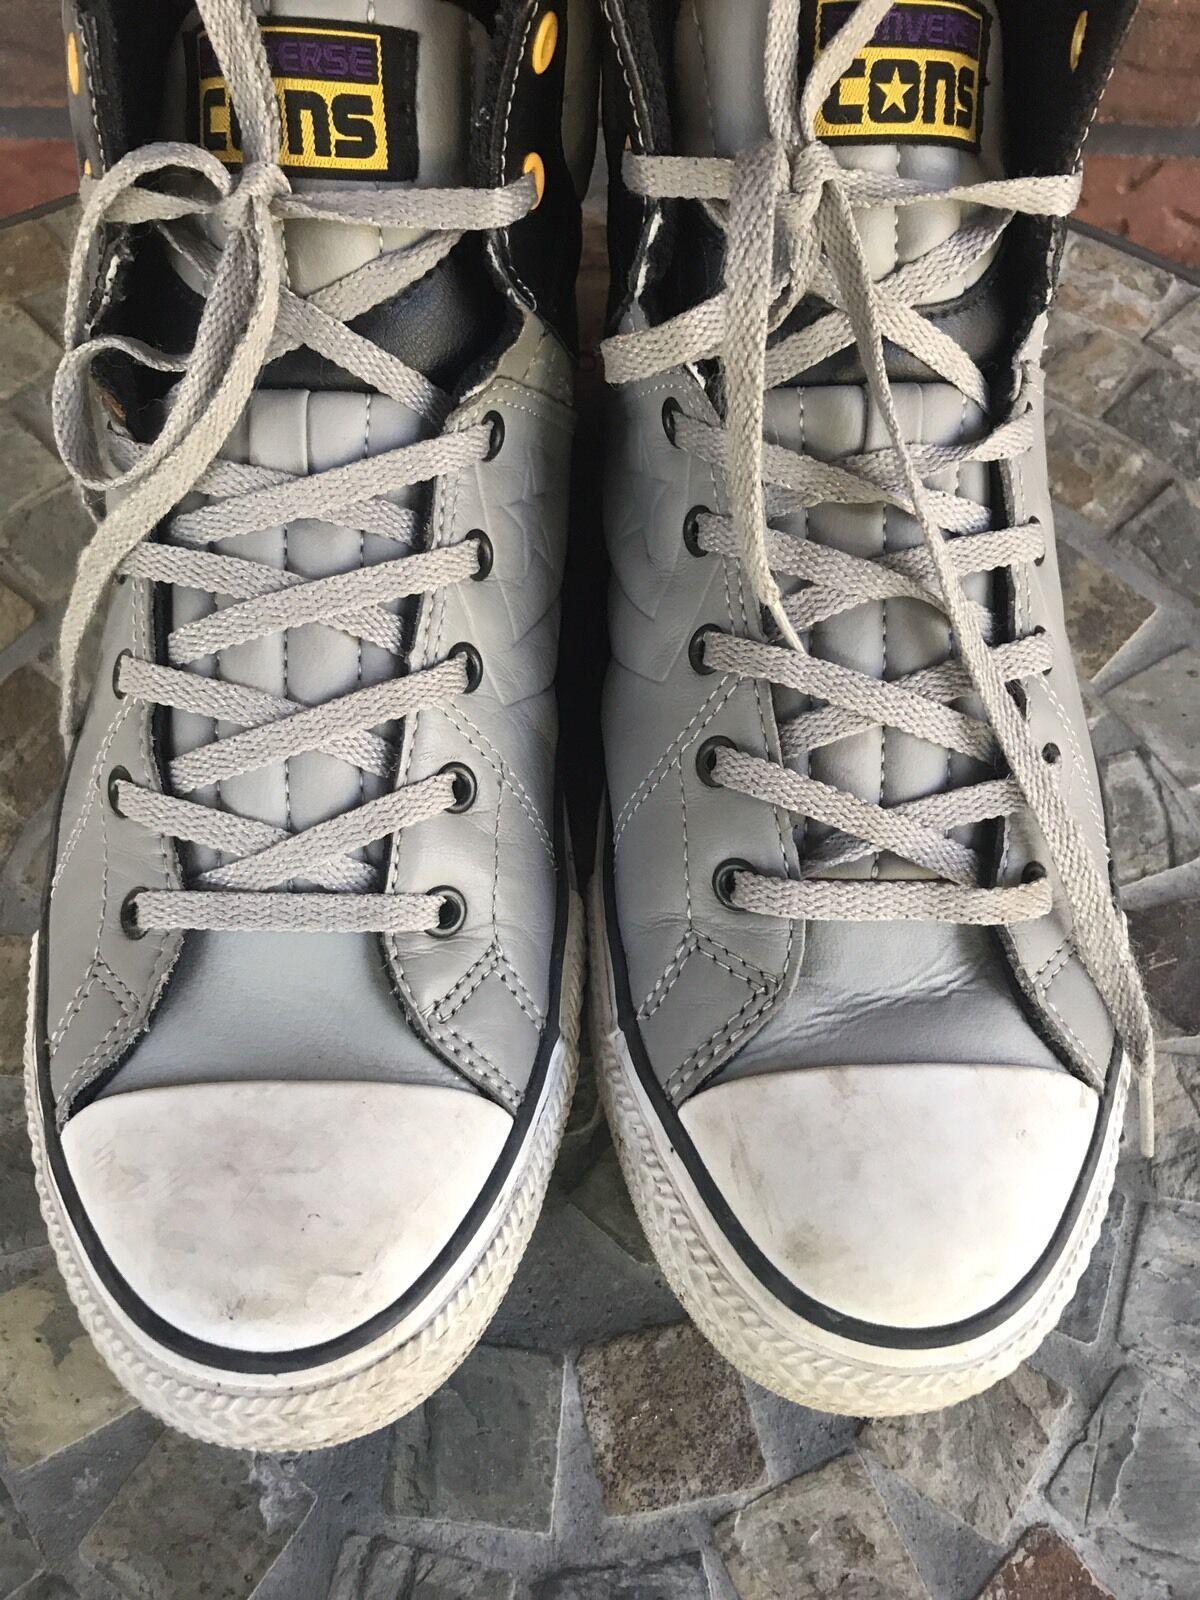 Cons Converse Men Sz 10 Women Sz 12 High Top Shoes Black Gray Yellow Tennis Shoe image 5